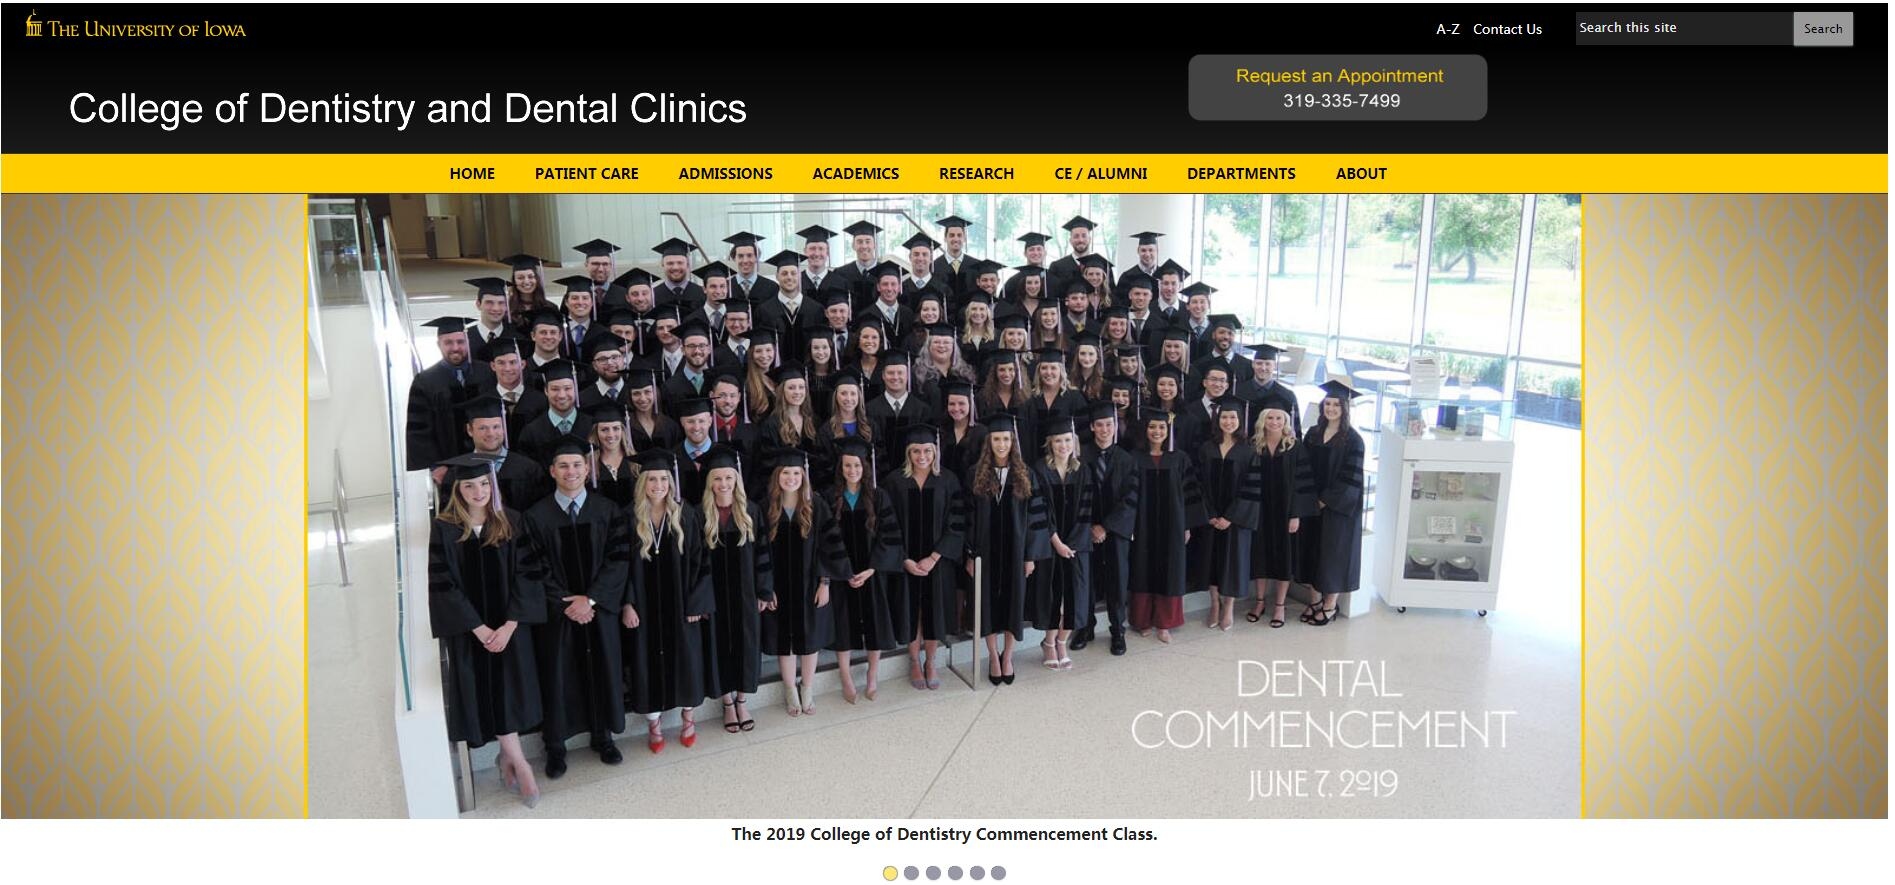 University of Iowa College of Dentistry